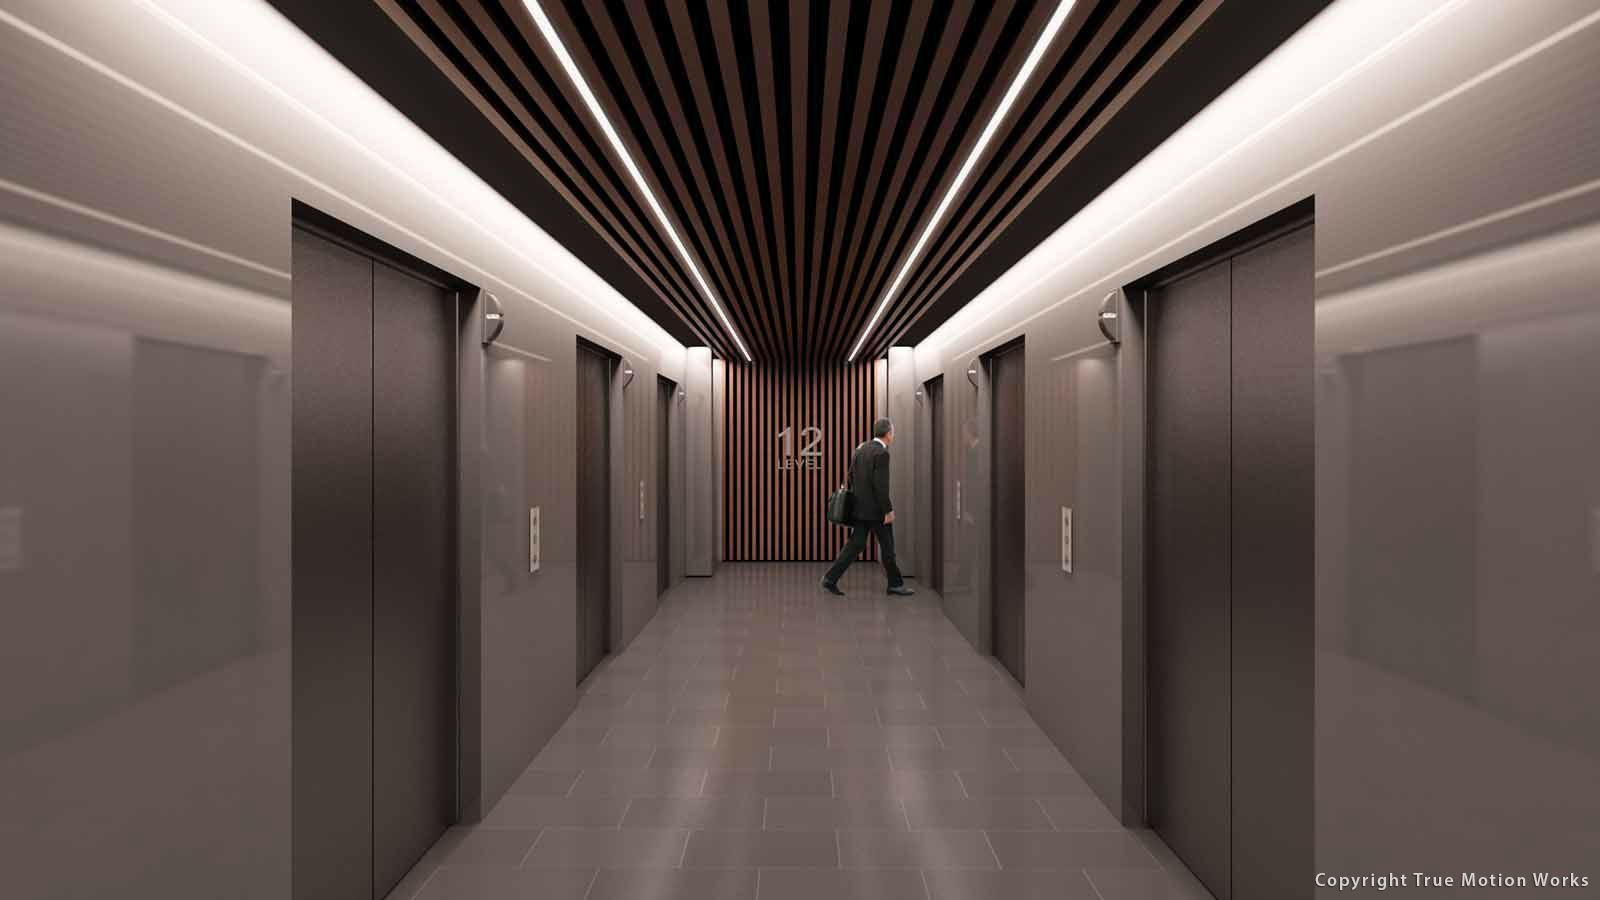 Corridor Design Ceiling: High End Elevator Lobby - Google Search